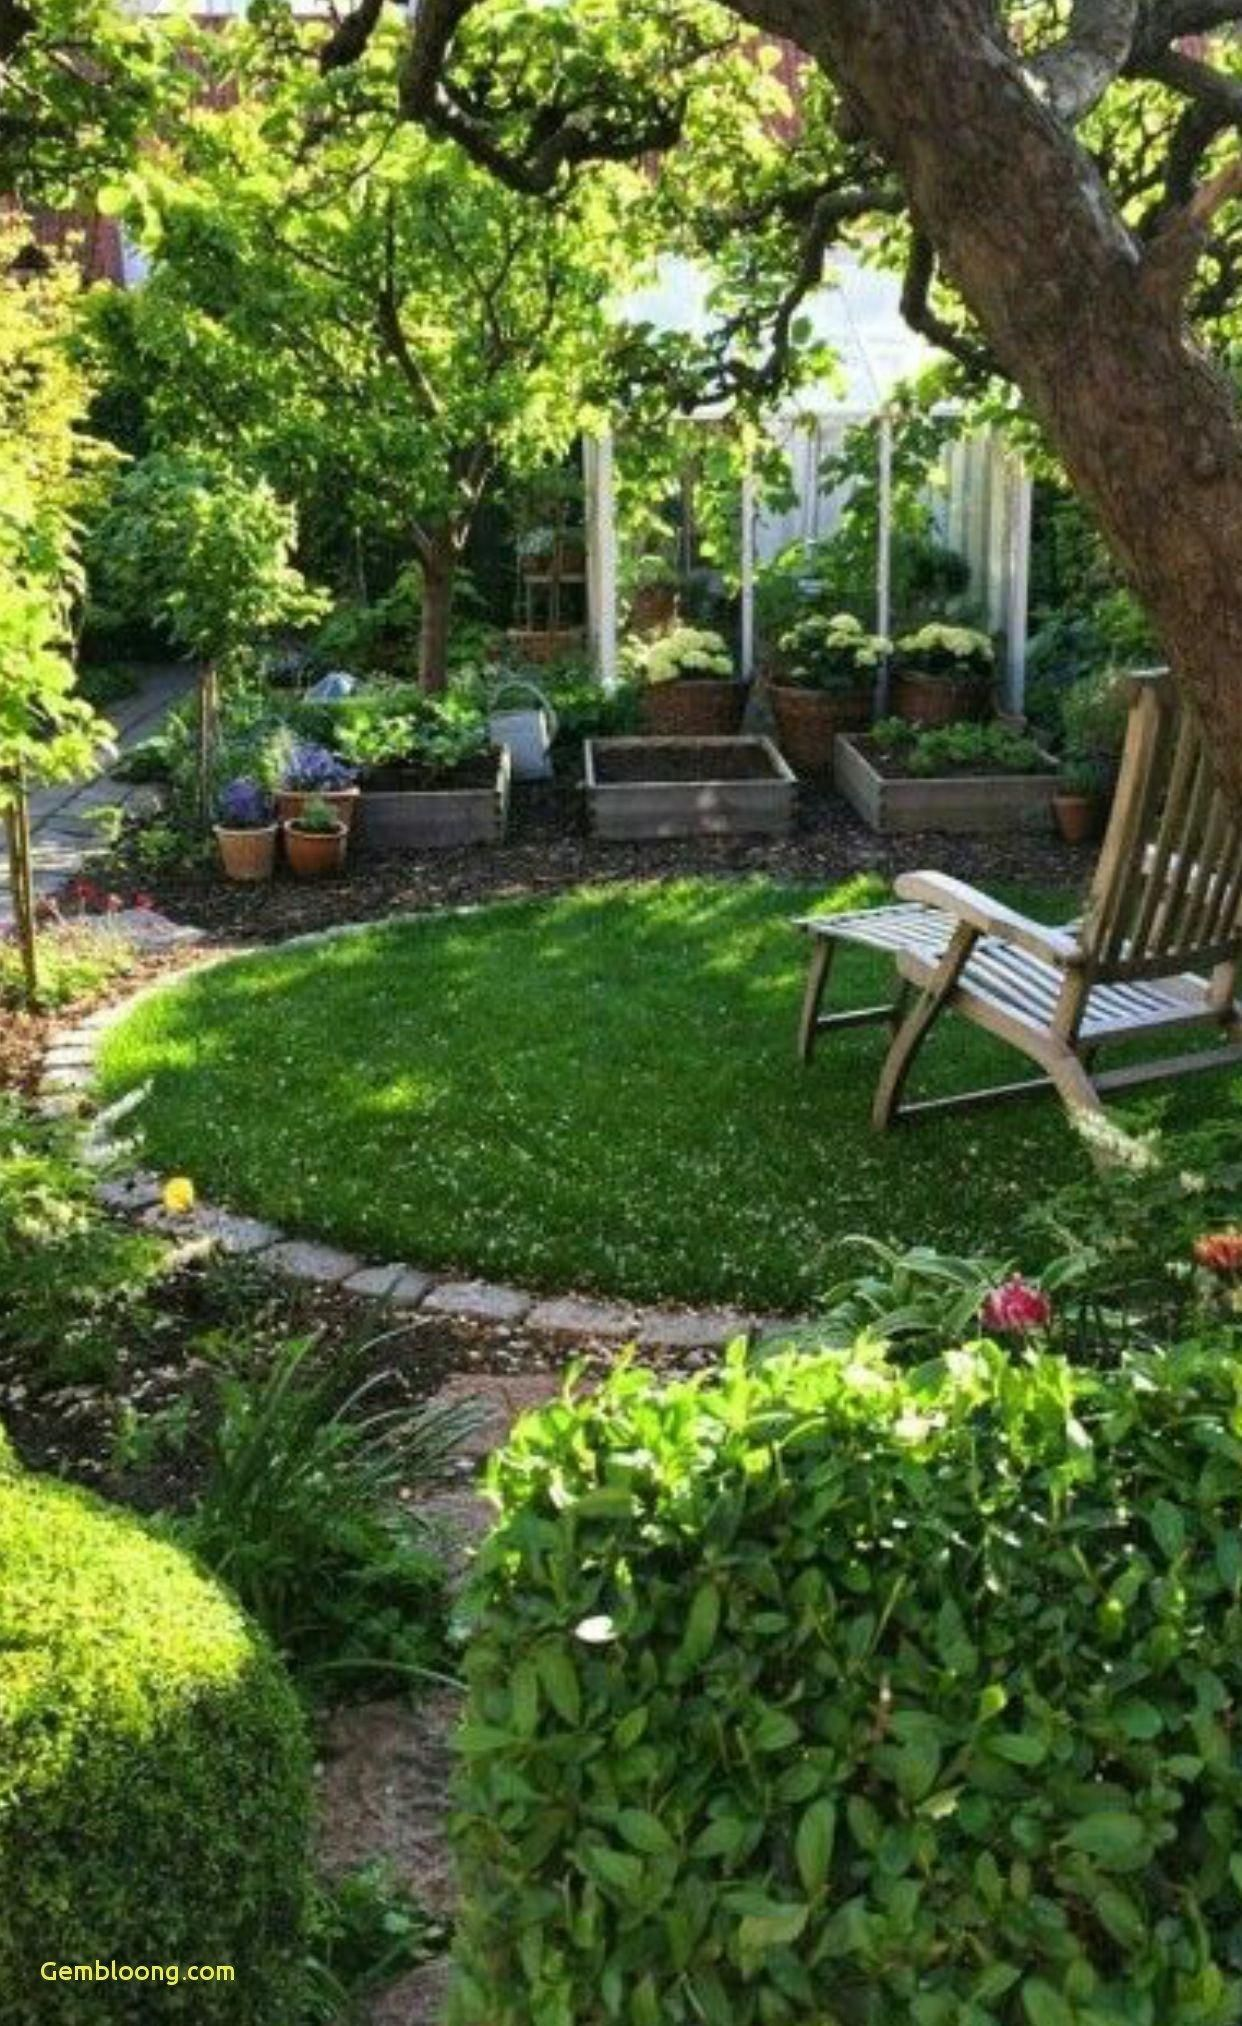 Landscape Gardening Courses Lancashire Small Backyard Landscaping Cottage Garden Design Small Garden Design